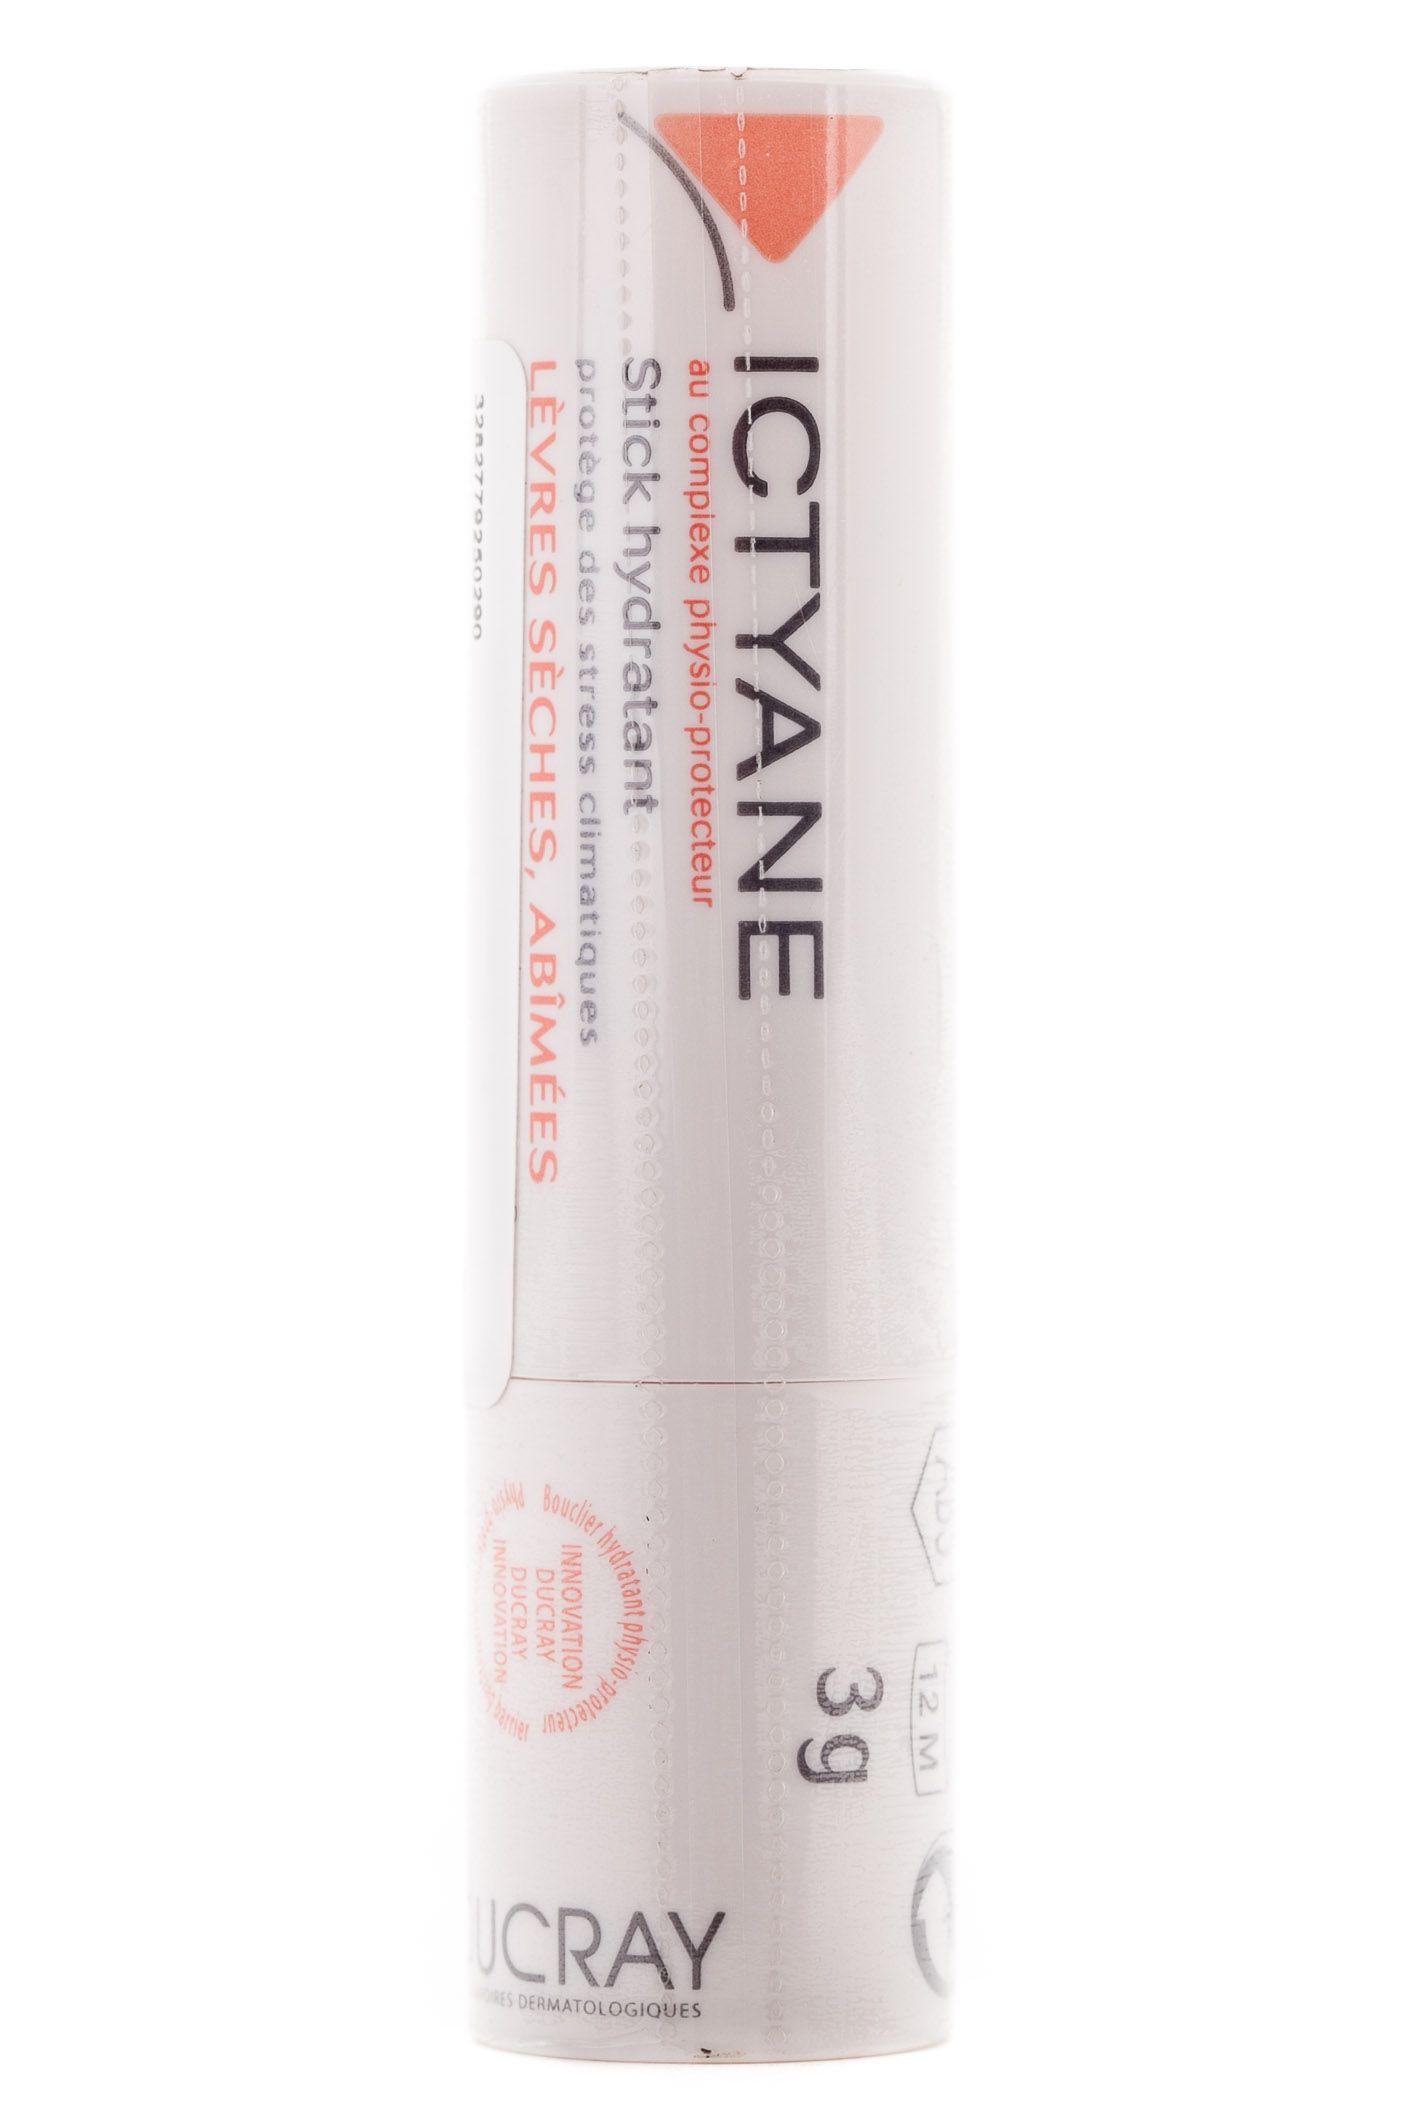 Ducray Ictyane стик для губ увлажняющий, помада, 3 г, 1 шт.